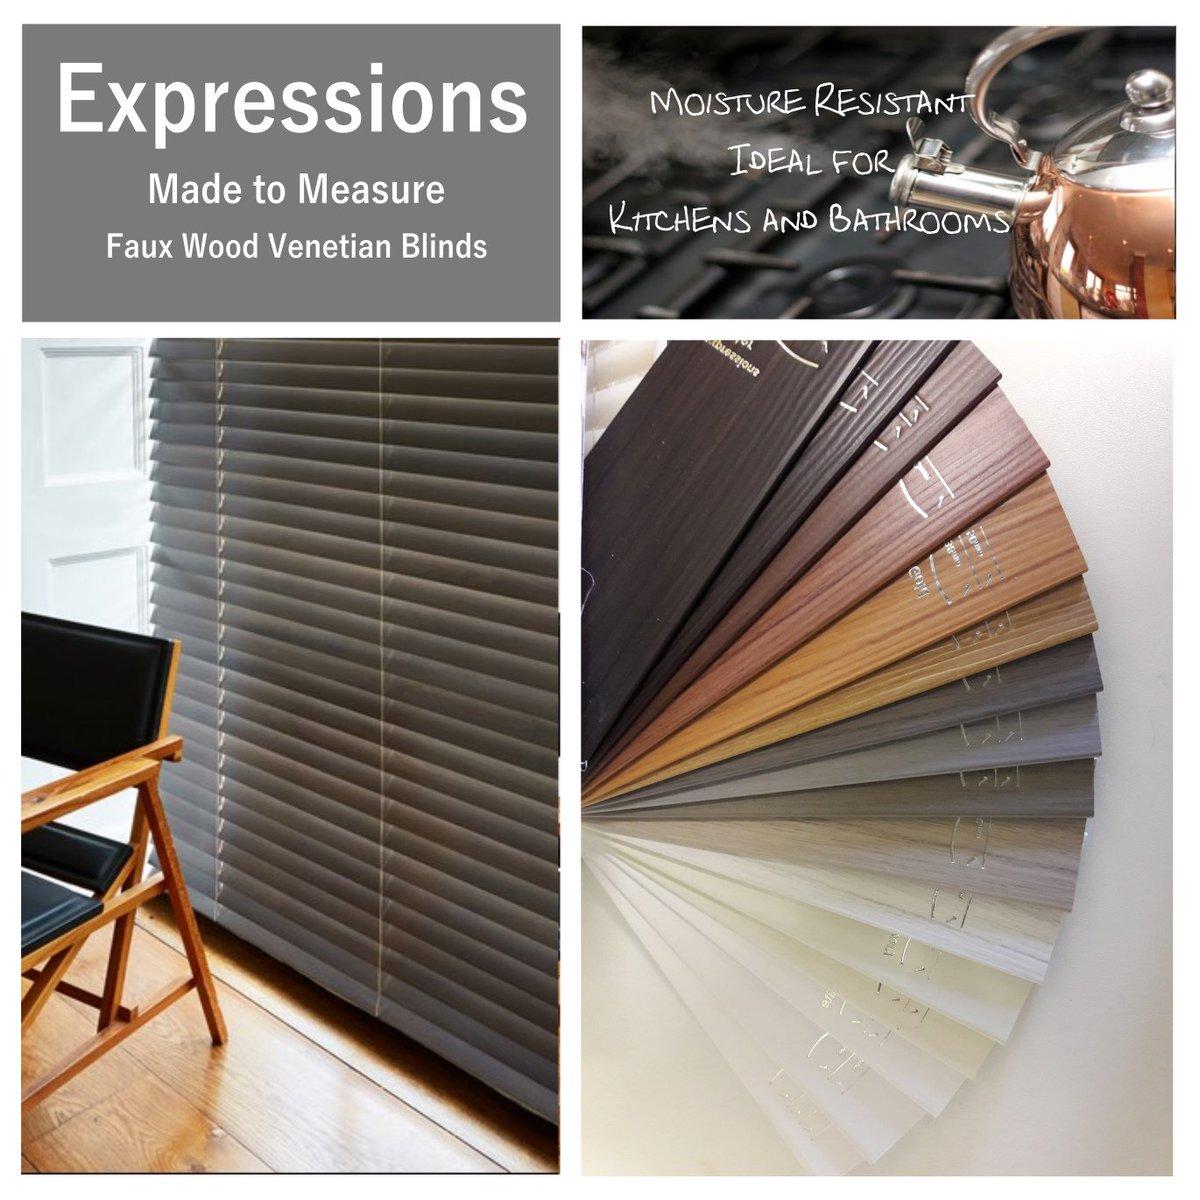 Made to Measure Faux Wood Venetian Blinds Moisture Resistant #kitchen #bathroom #interiordesign #interiors<br>http://pic.twitter.com/fWt2p0zbg2